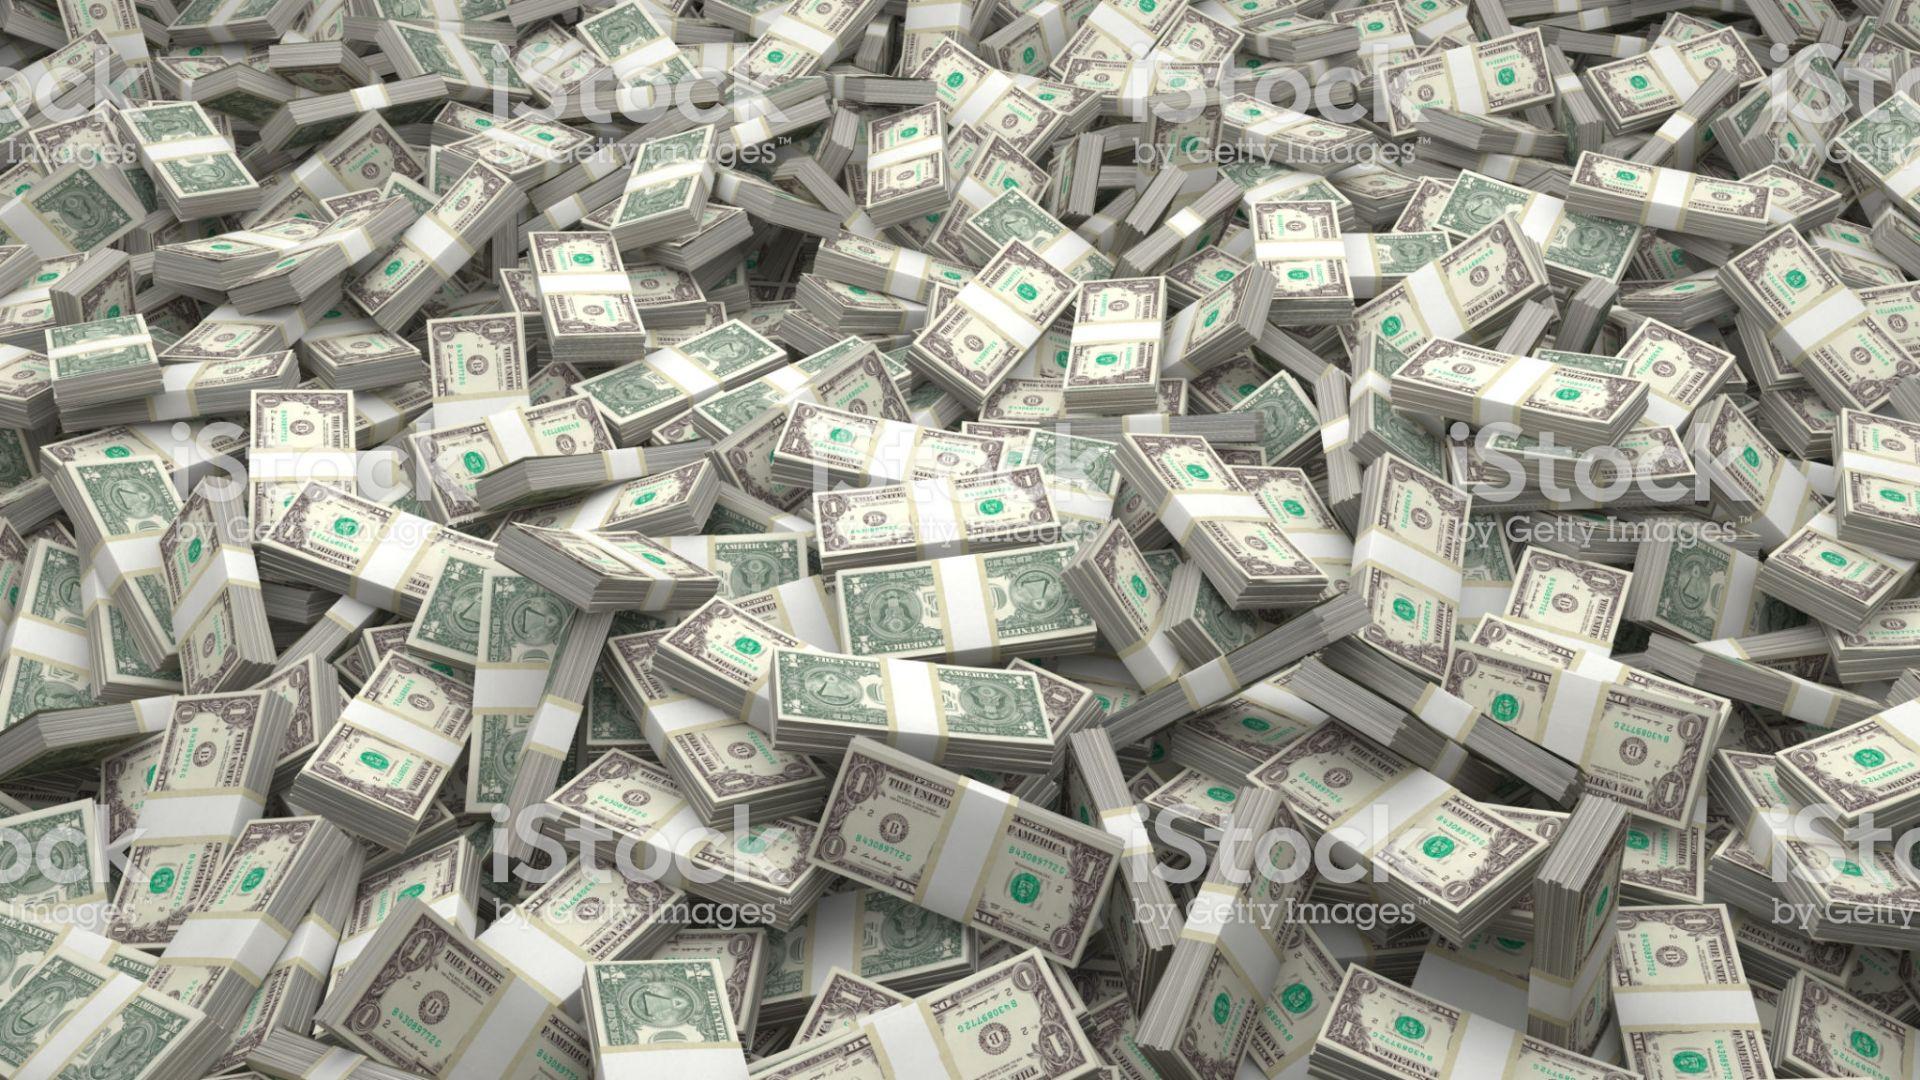 Фалшиви полицаи откраднаха 3,7 млн. долара от швейцарка